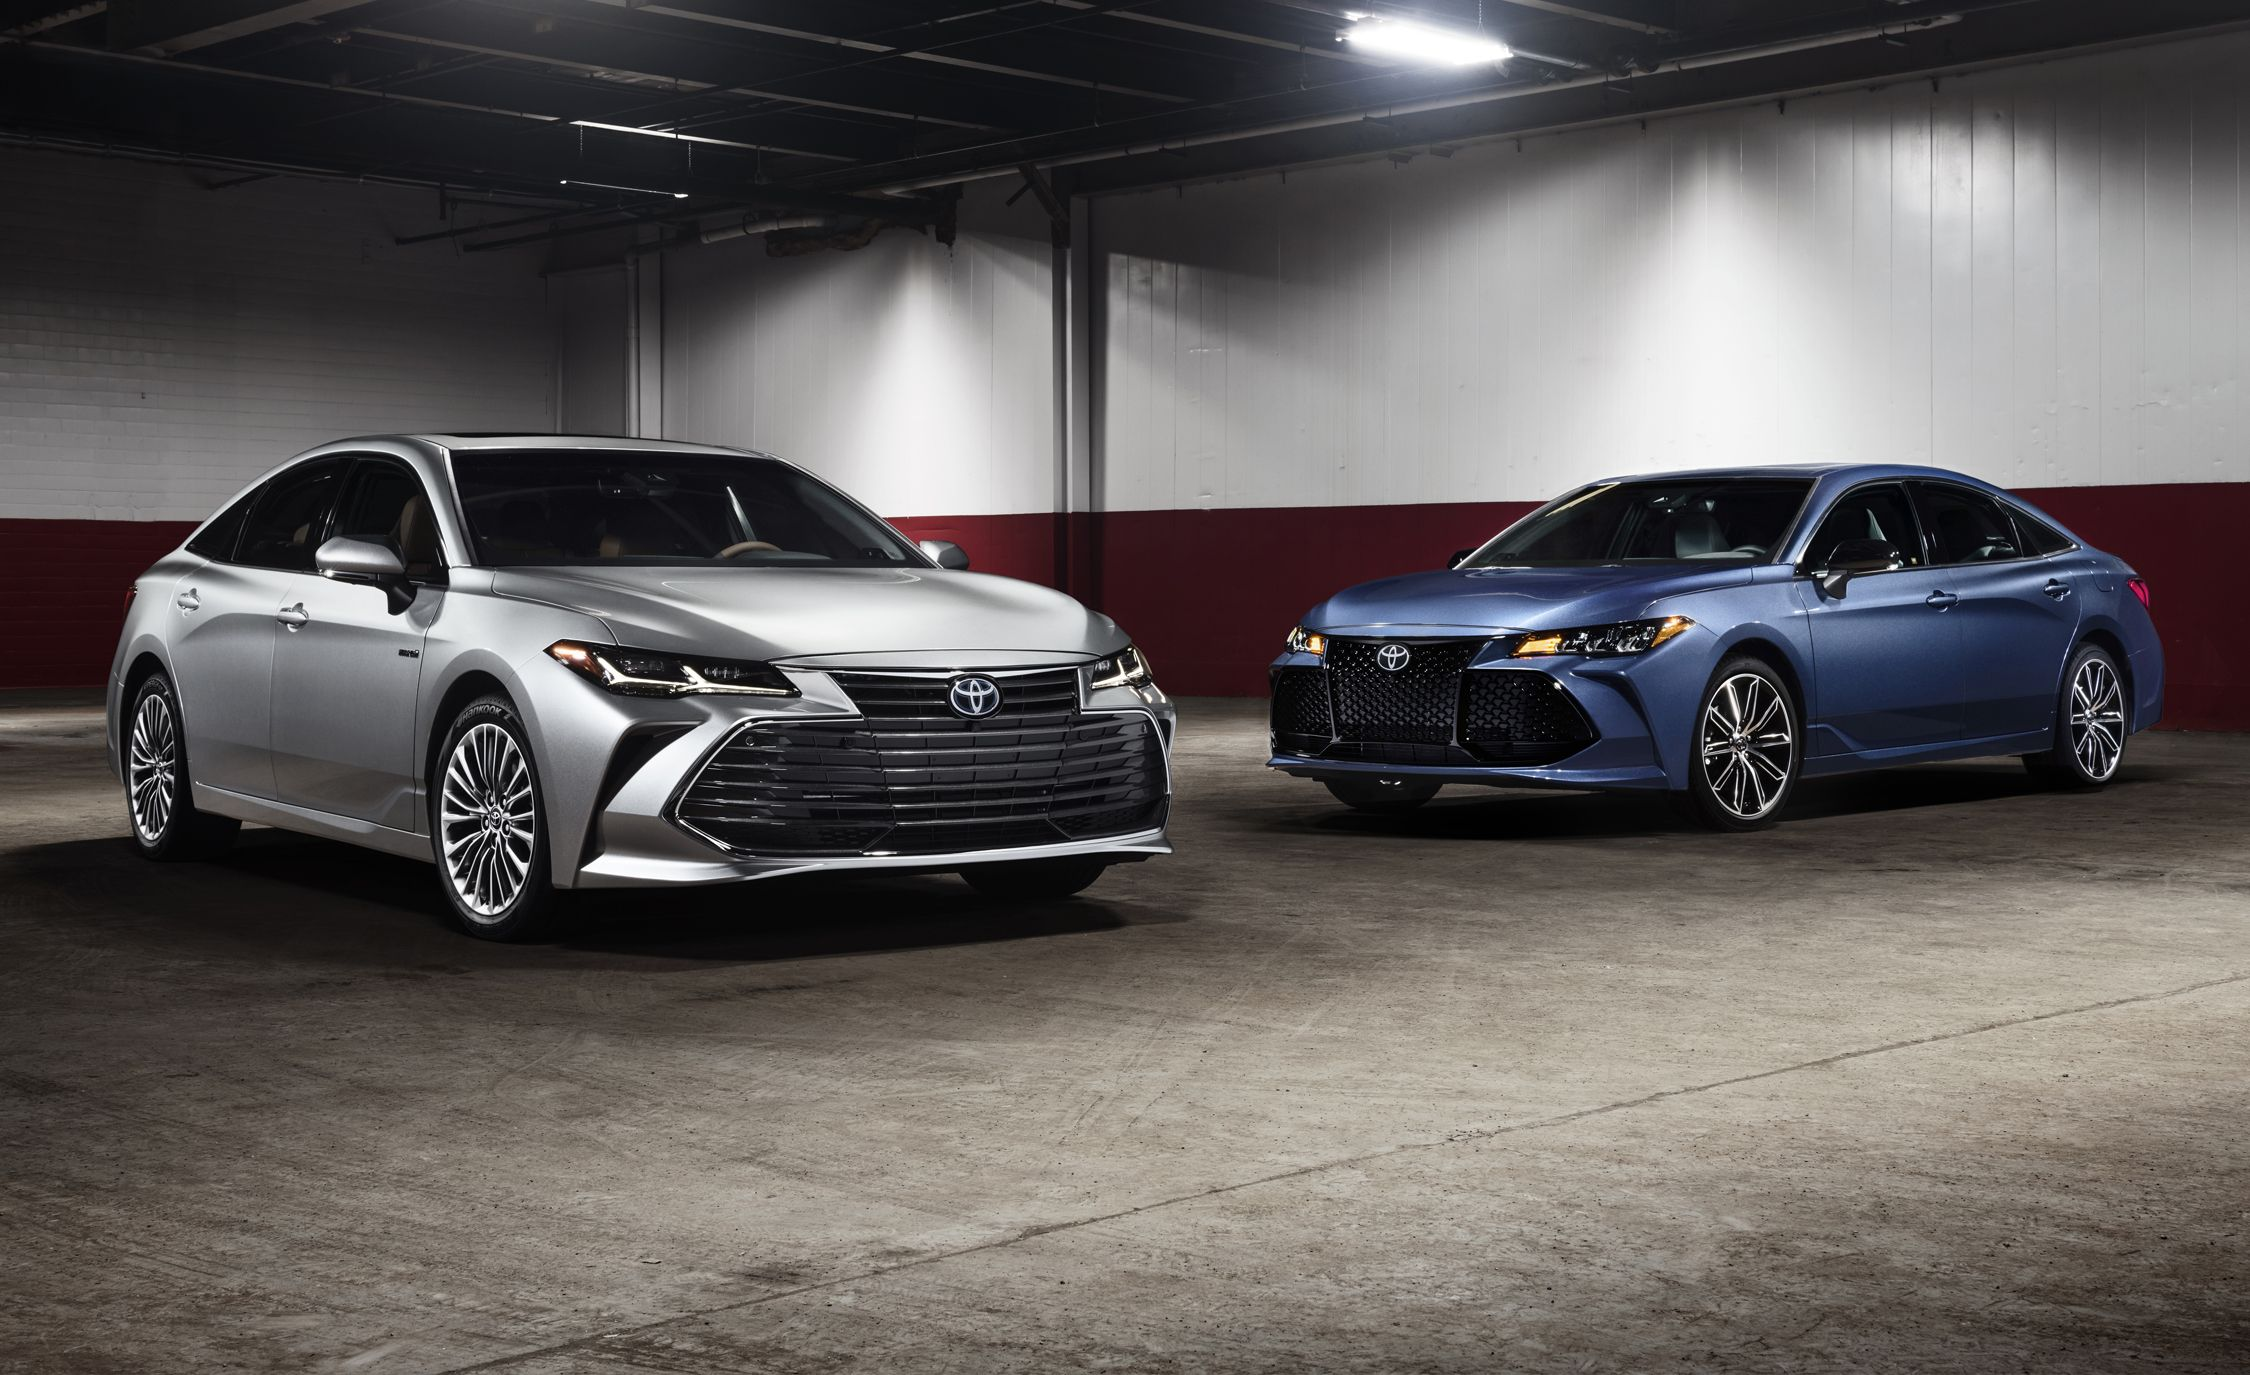 2019 Toyota Avalon: A Snoozer Turns Snazzy